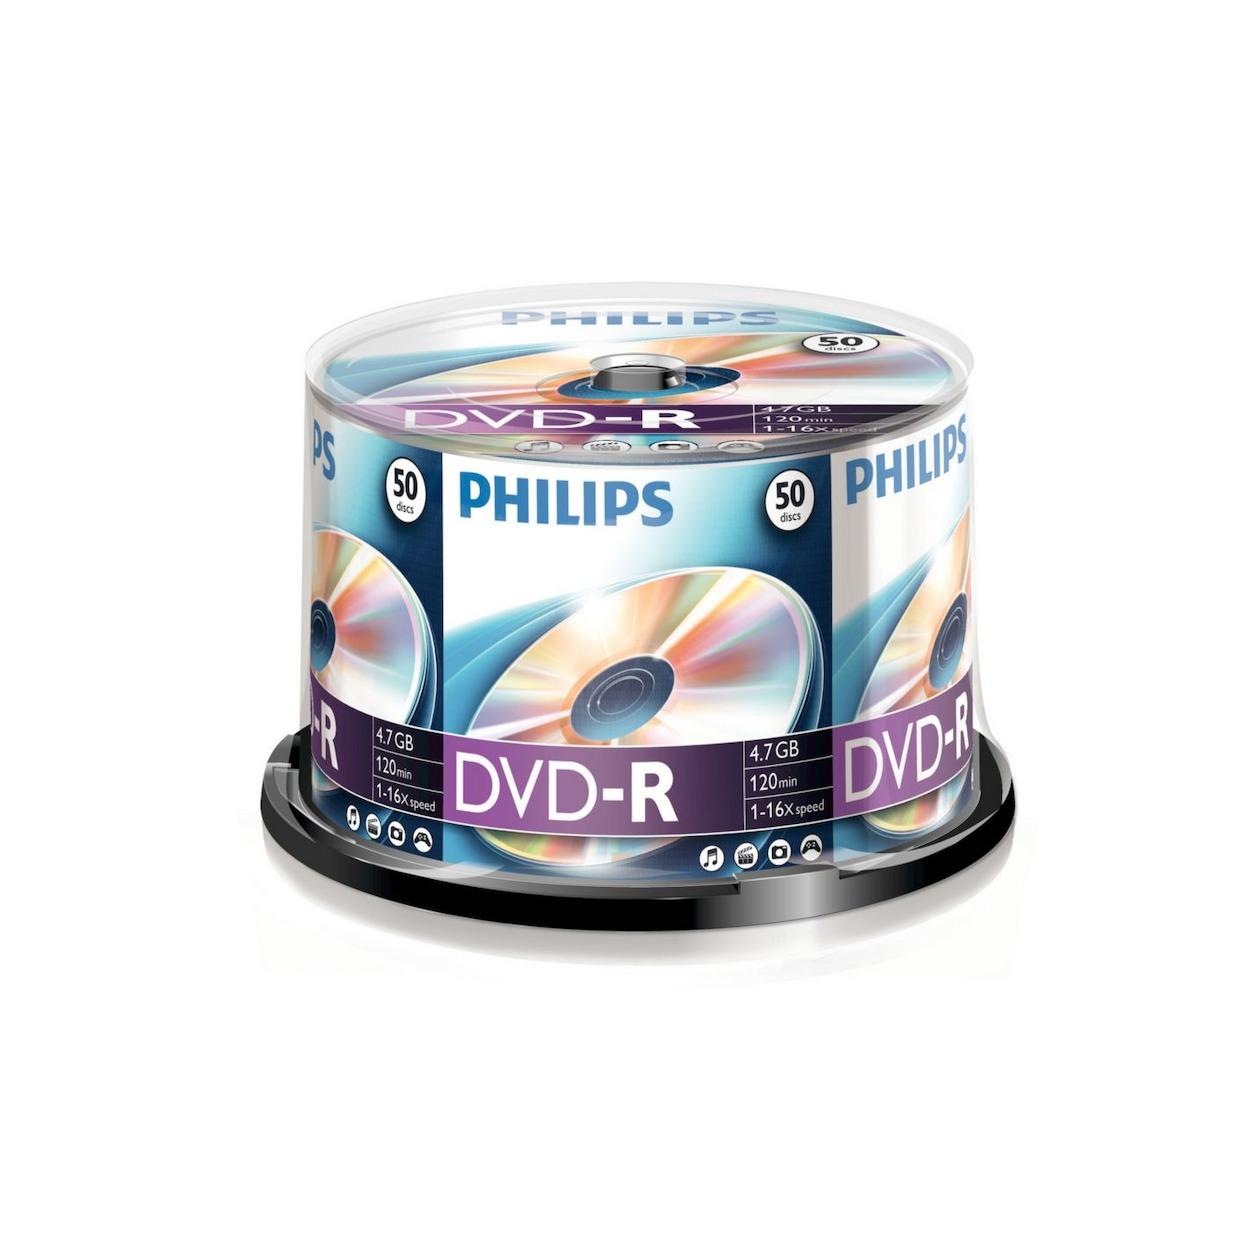 philips DVD-R DM4S6B50F